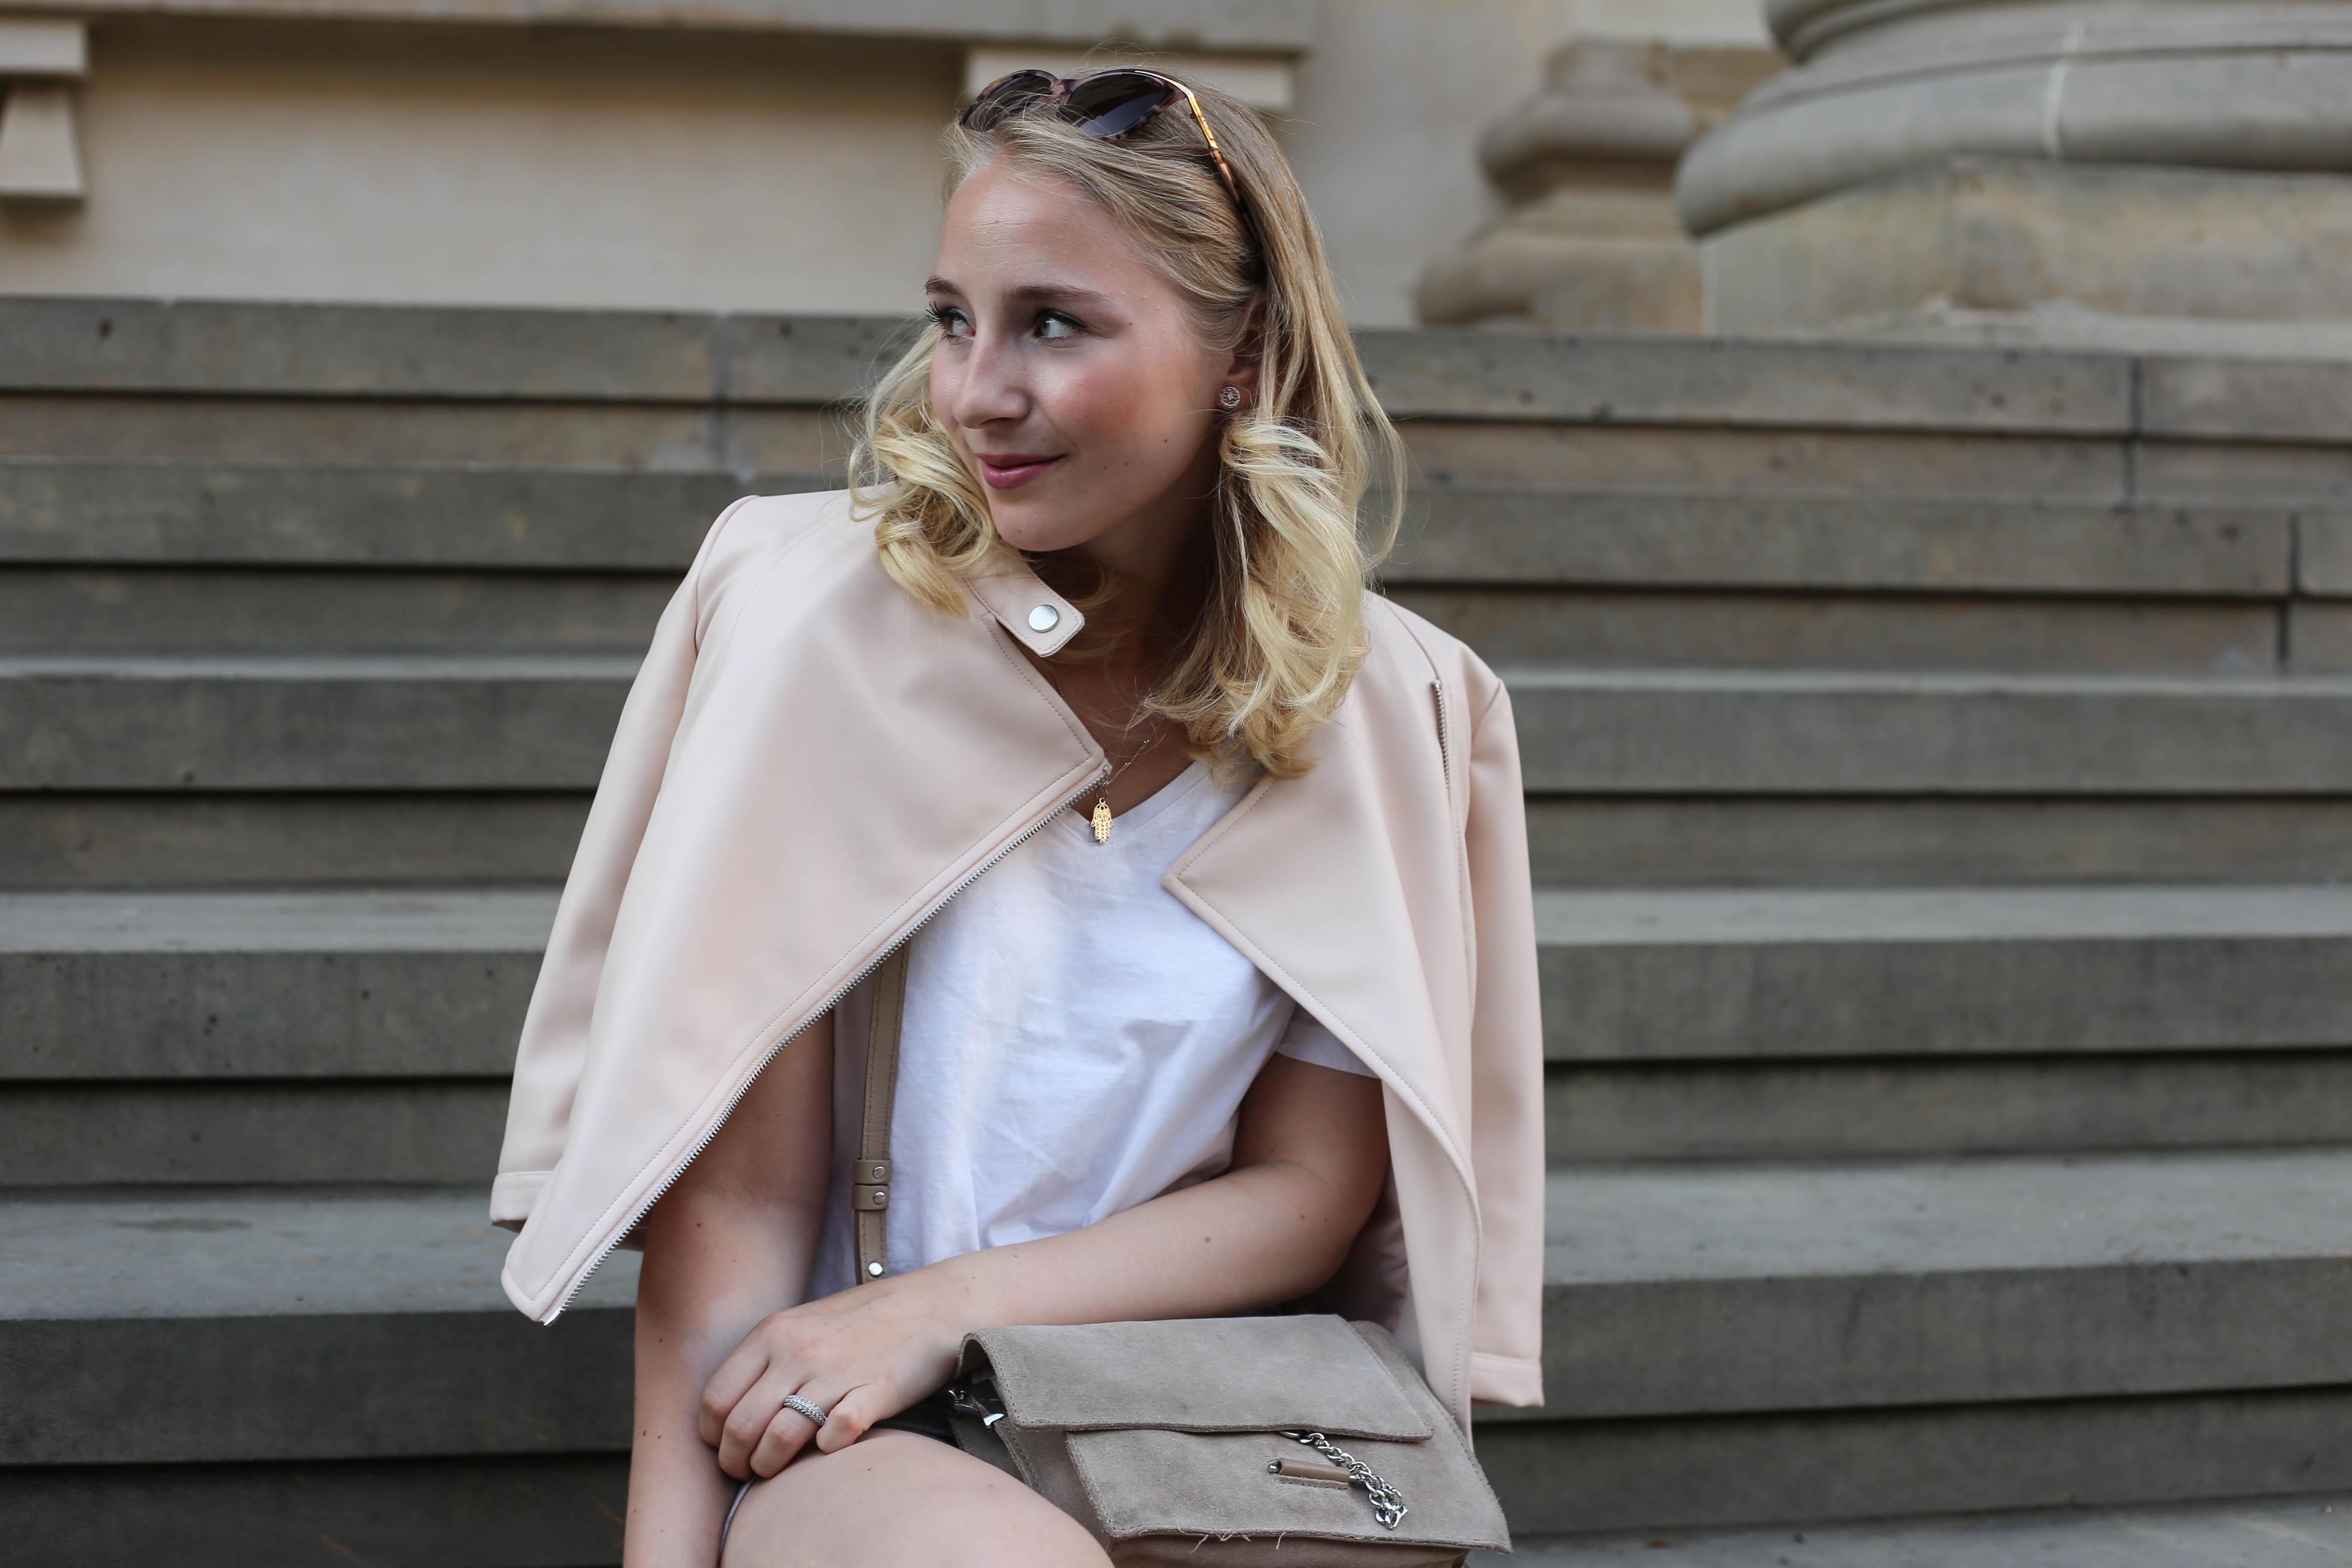 rosa-lederjacke-mango-klotzabsatz-sandalen-fashionblog-berlin-mode-blog-outfit_2389 (1)